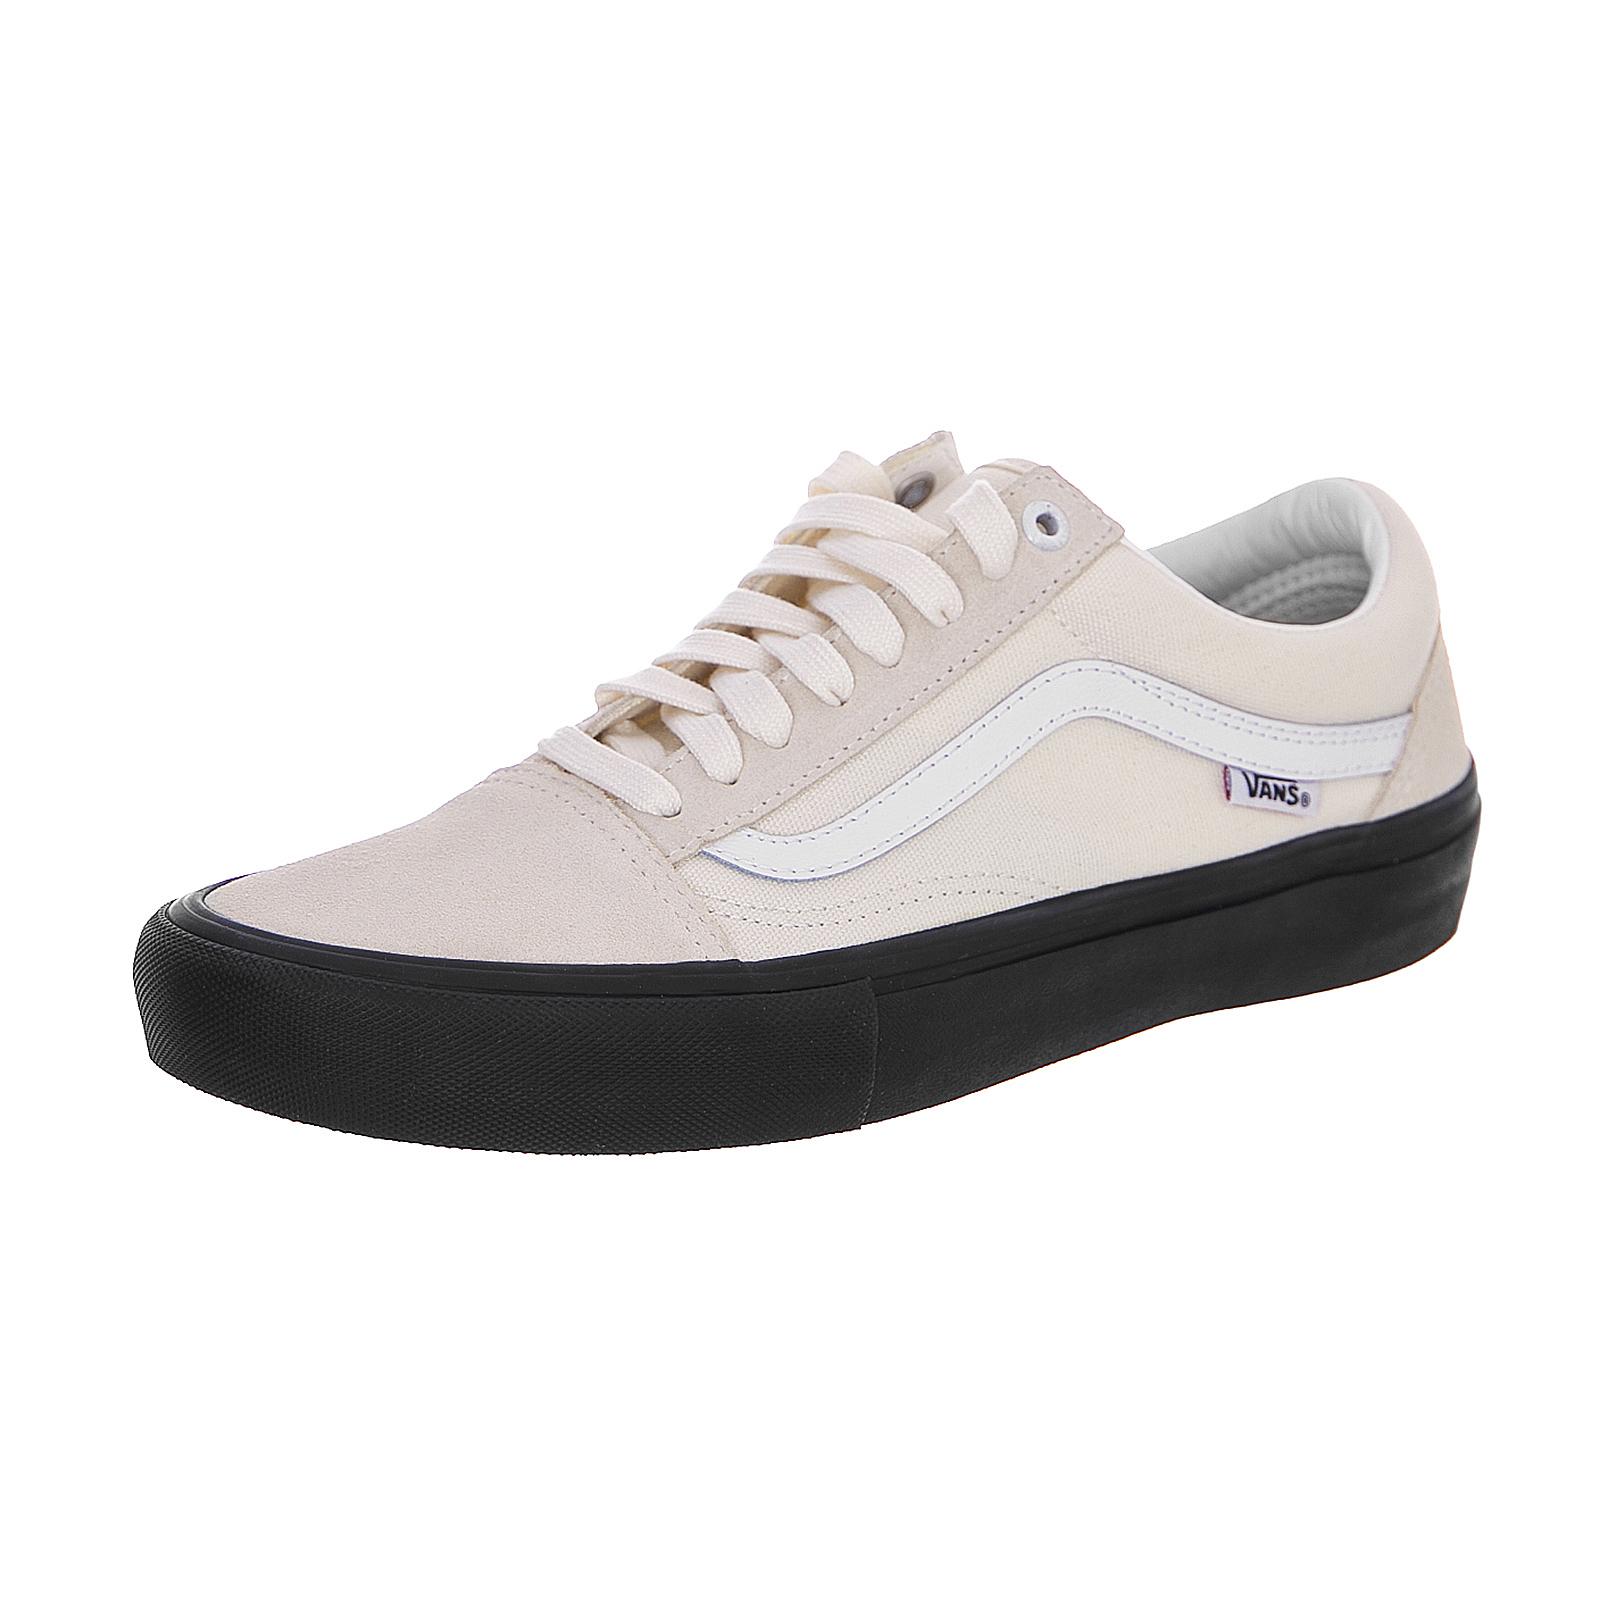 Vans Sneakers Mn Old Skool Pro Classic White/B Bianco